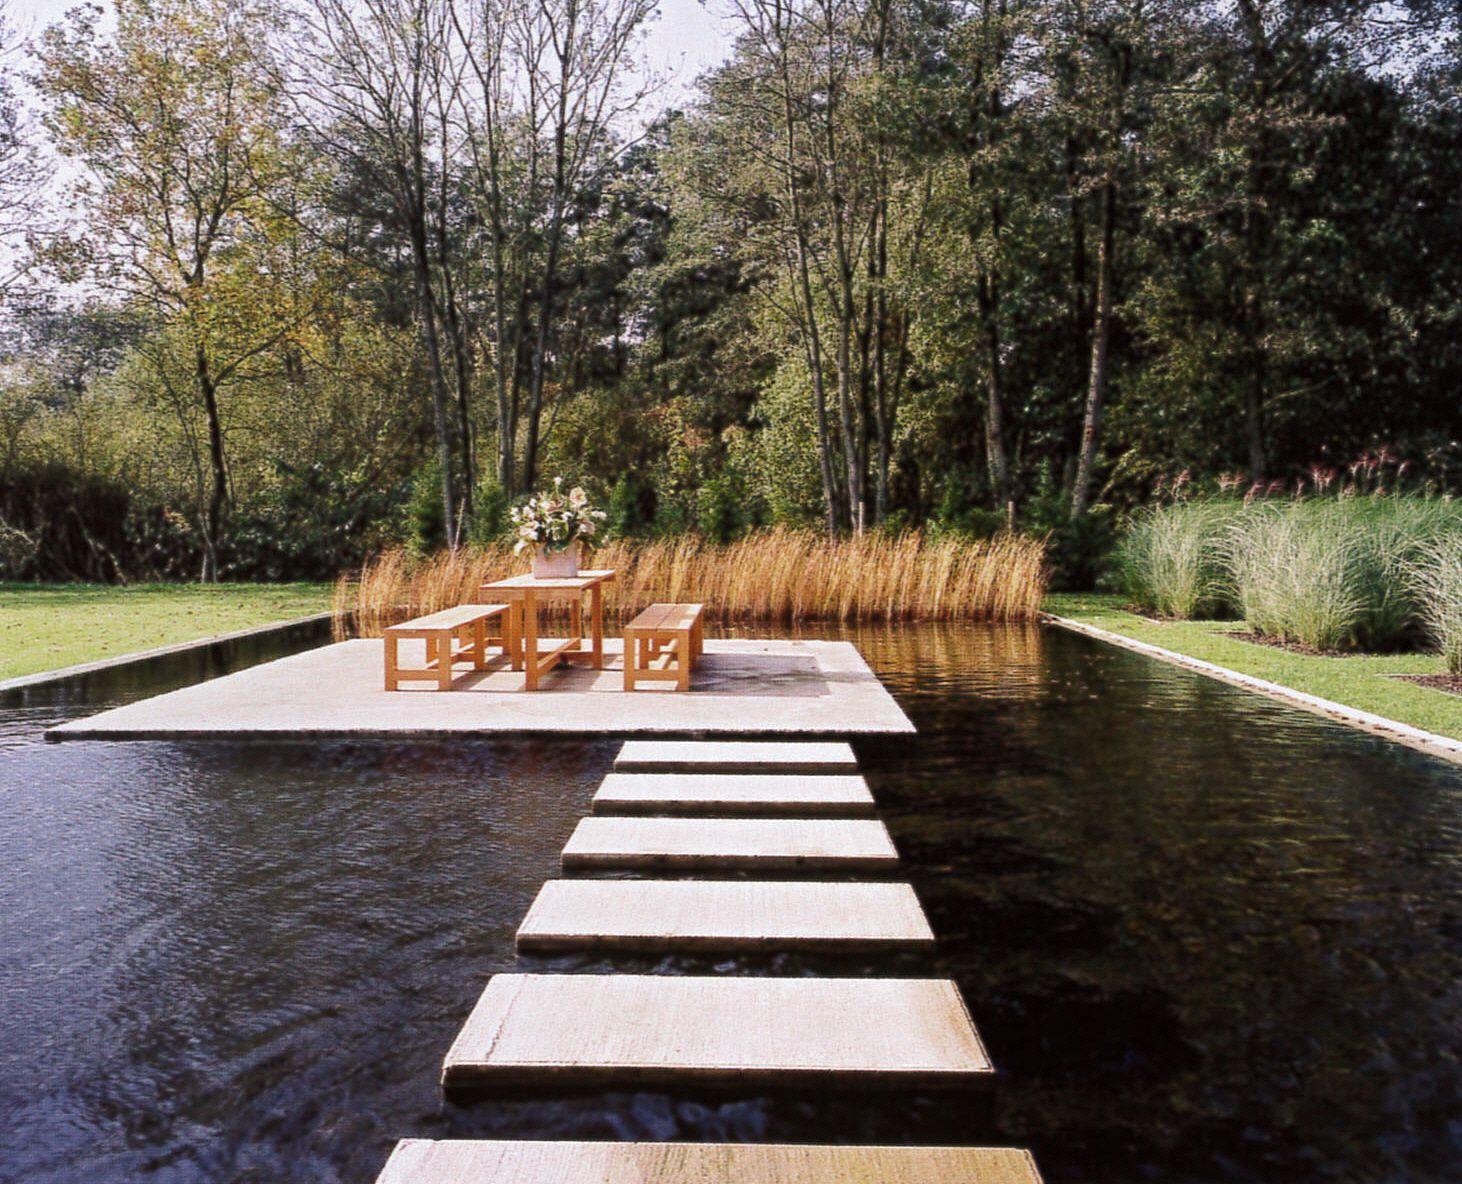 Pin by Kellen Goodell on Landscapes+Gardens | Pinterest | Decking ...